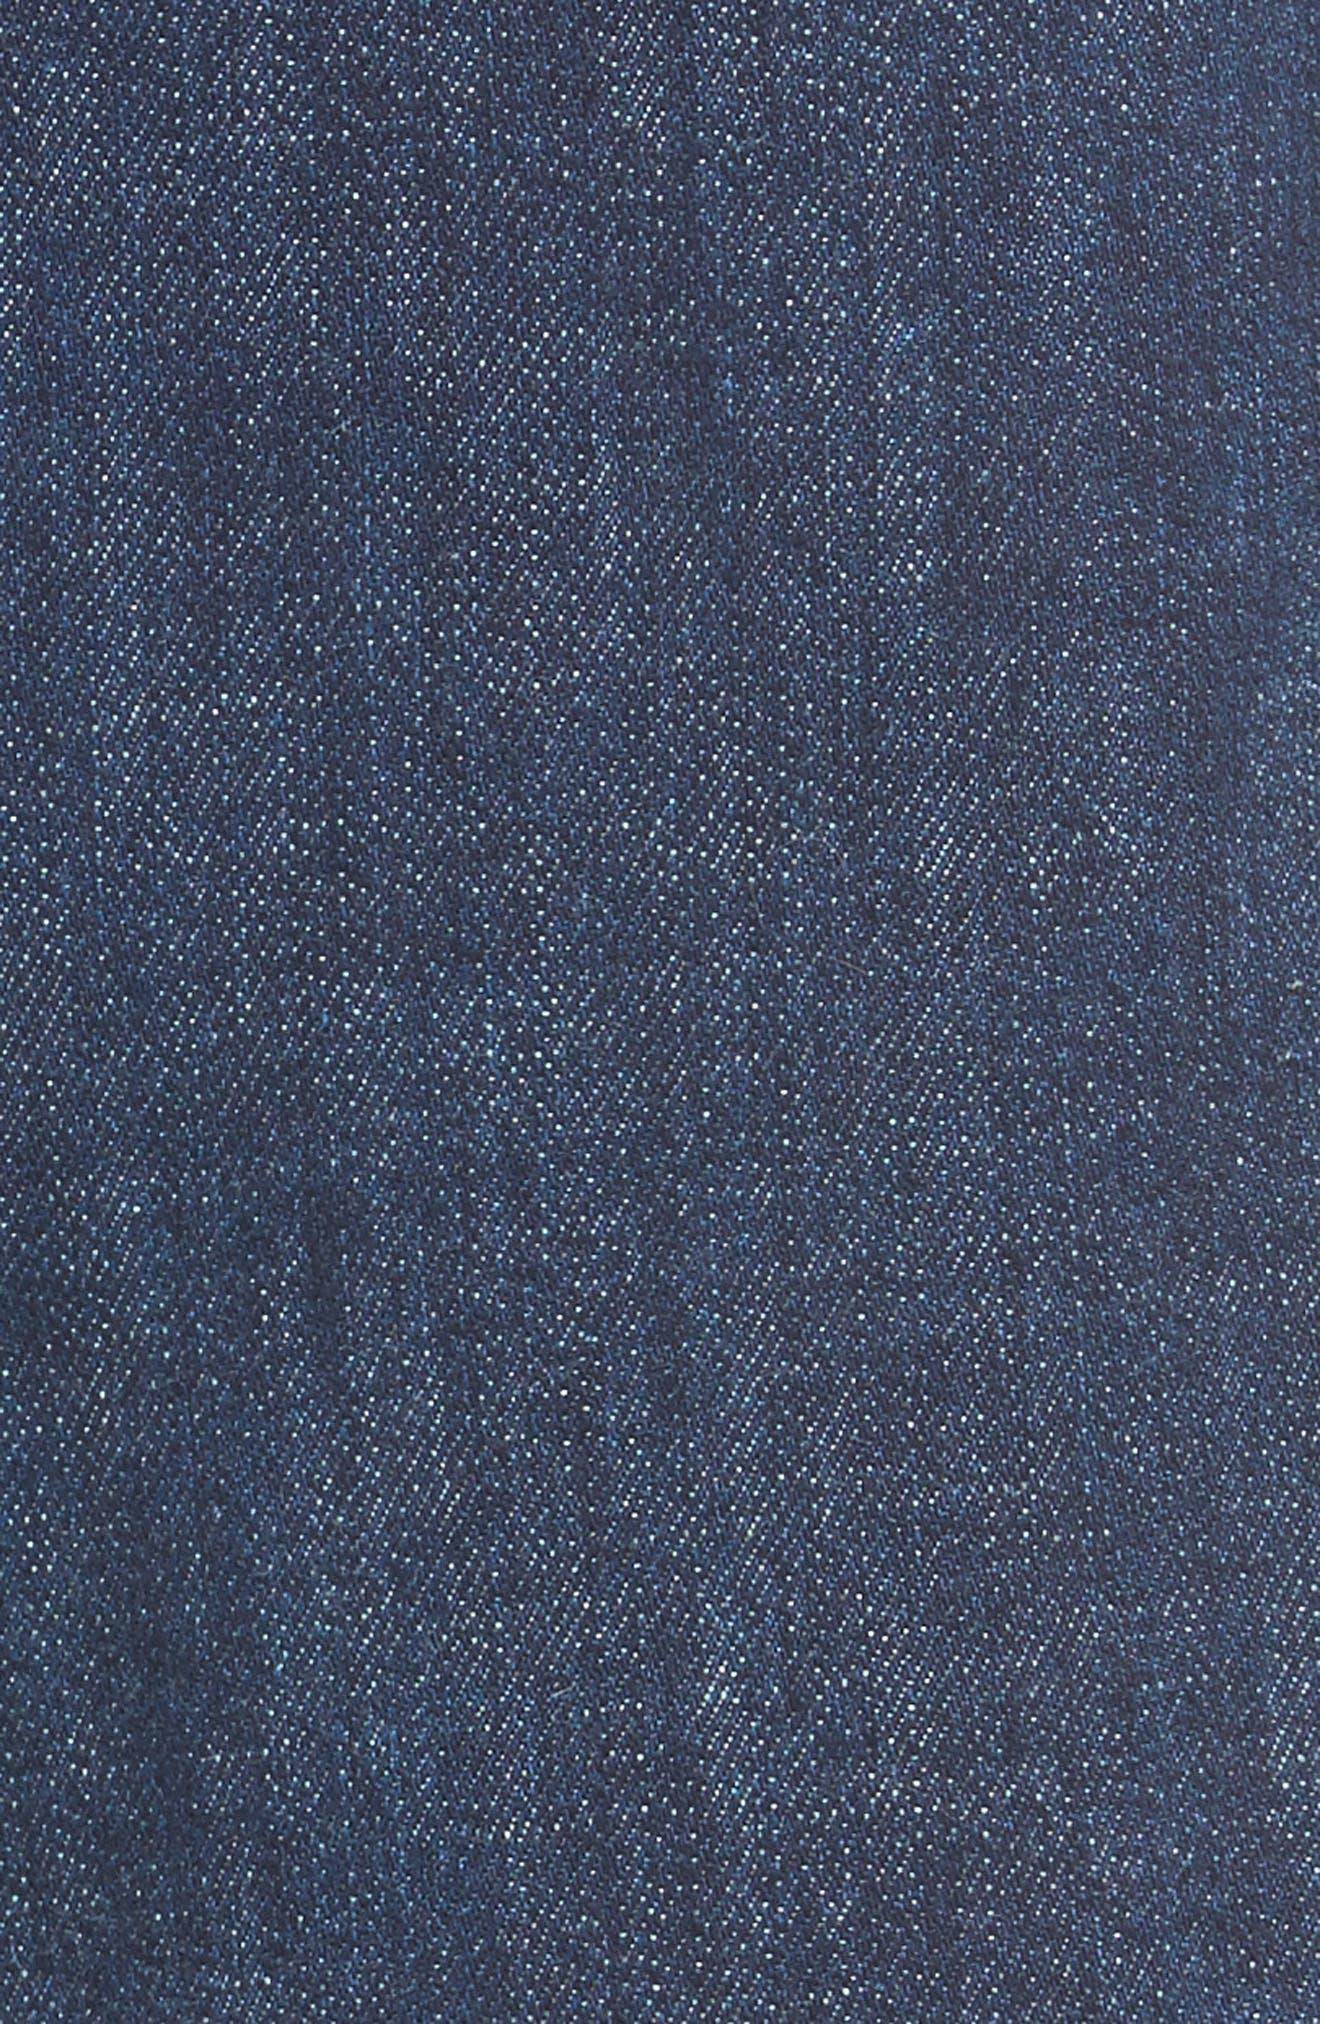 San Fran Super Flare Denim Pants,                             Alternate thumbnail 5, color,                             400